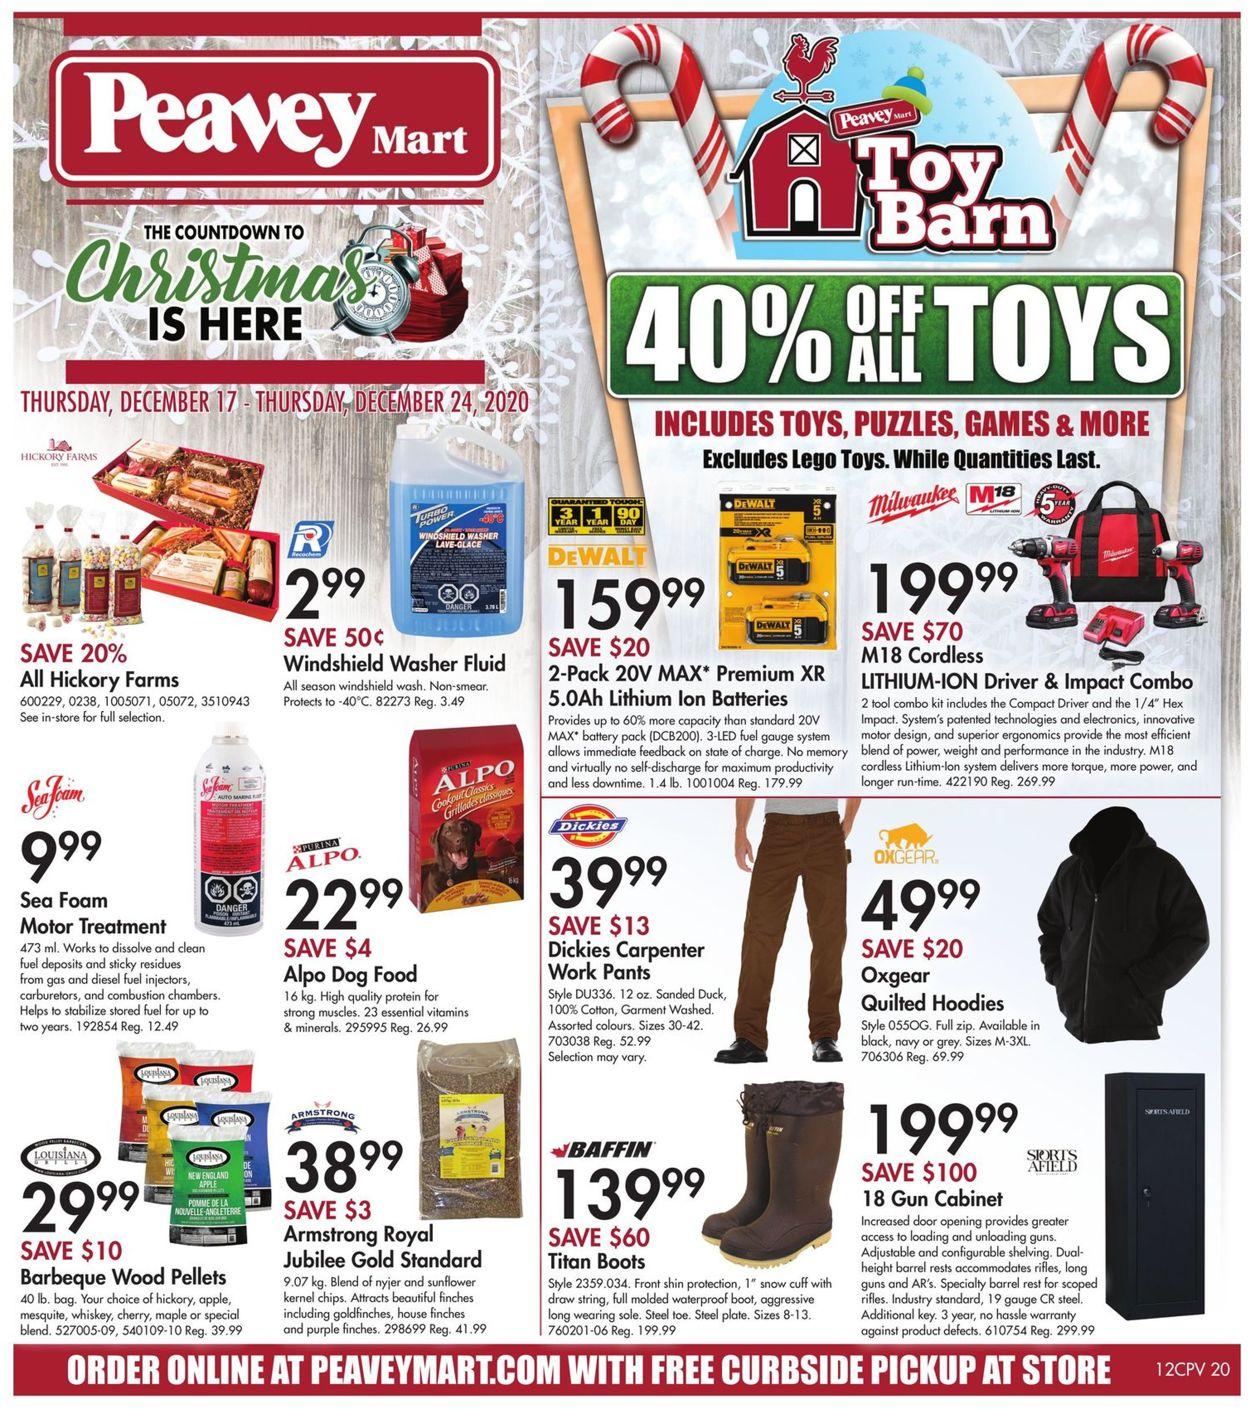 Peavey Mart - Christmas 2020 Flyer - 12/17-12/24/2020